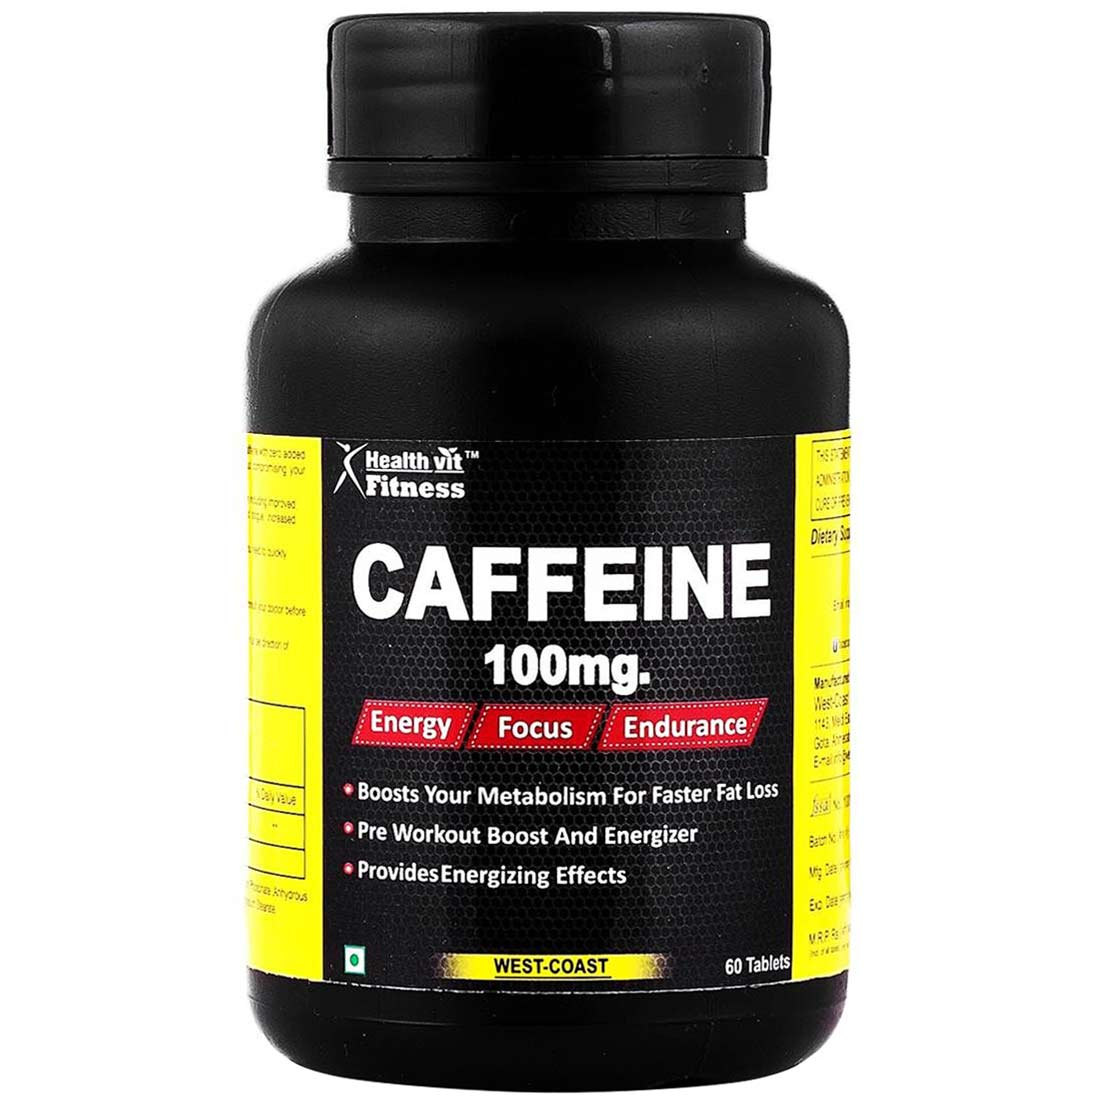 Healthvit Caffeine Image